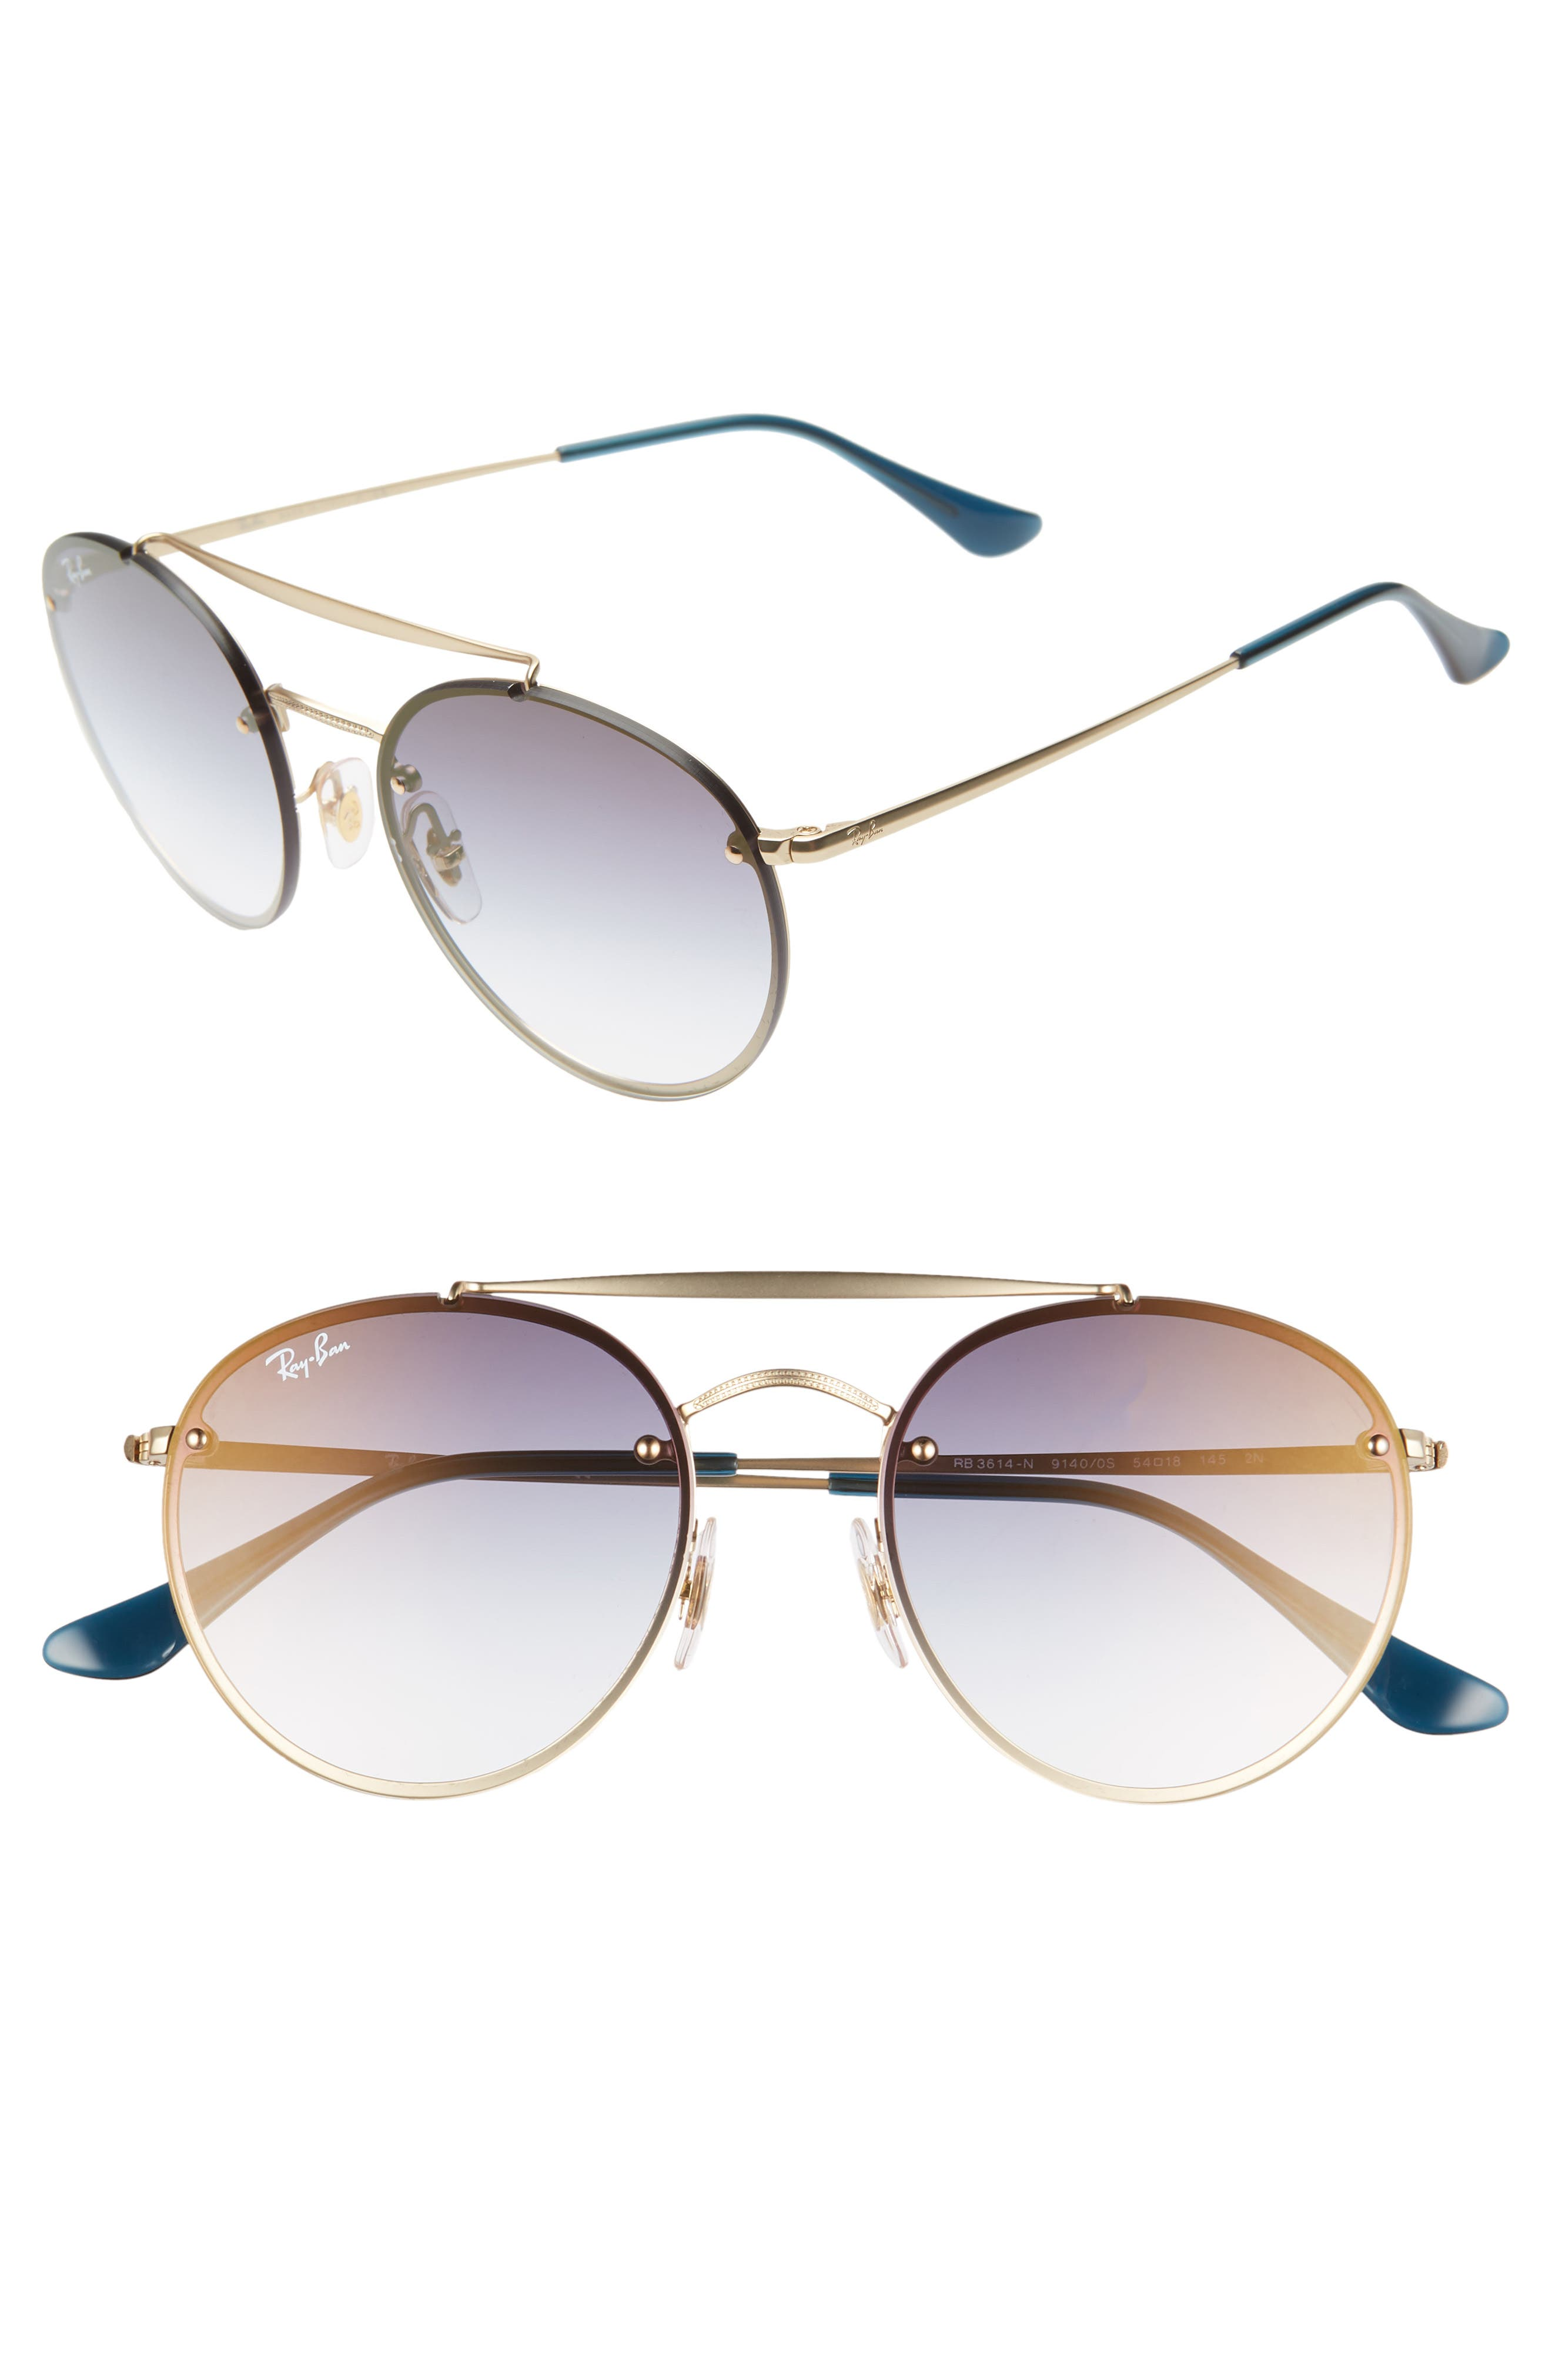 Ray-Ban 5m Polarized Gradient Round Sunglasses - Gold/ Blue Gradient